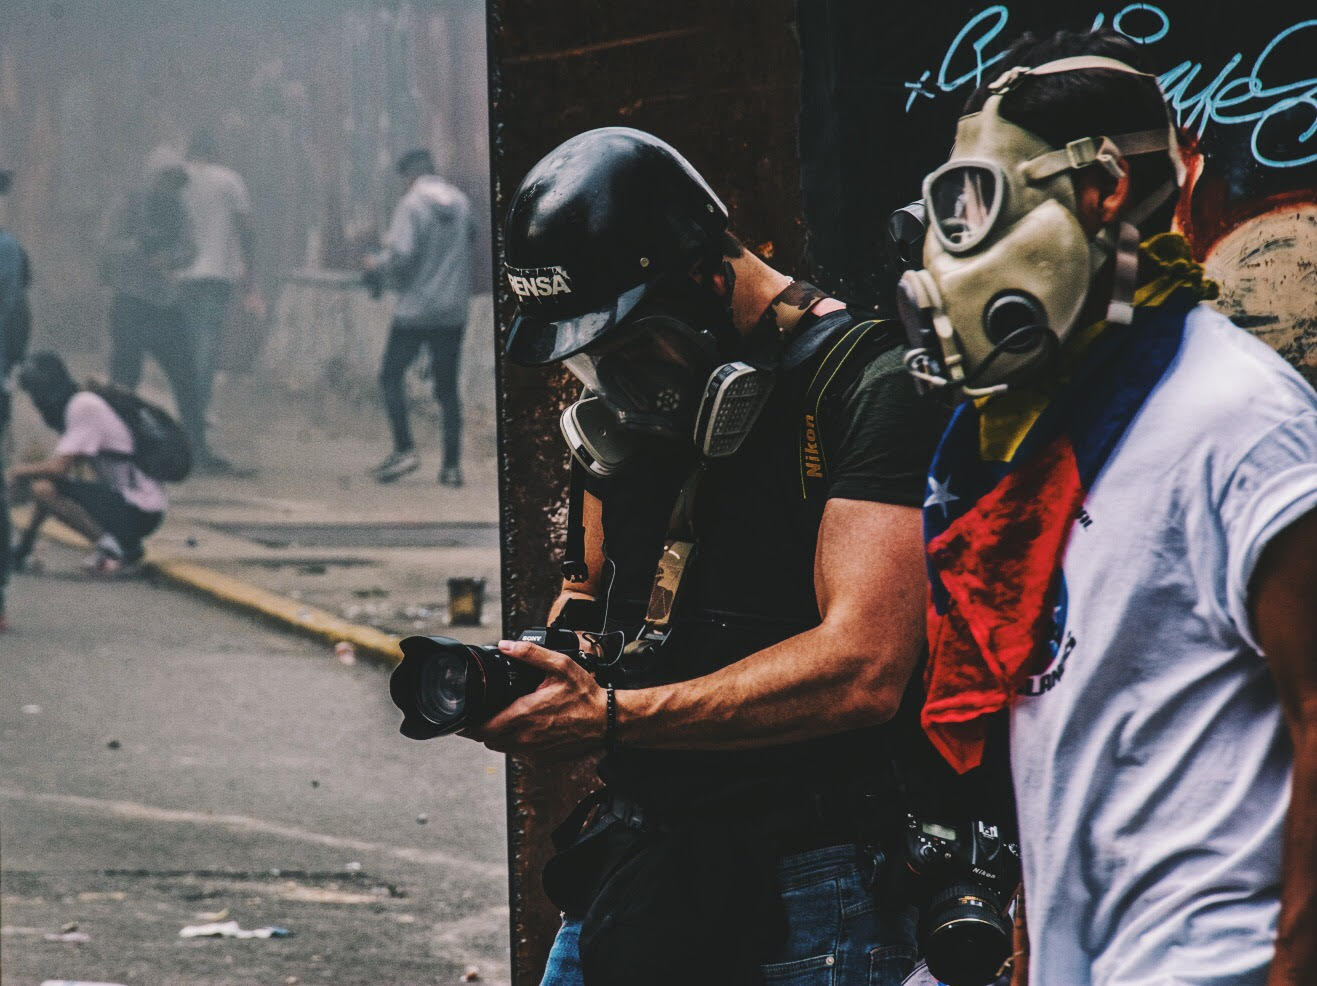 Braulio Jatar shooting during Venezuelan protests. Courtesy of NYFA